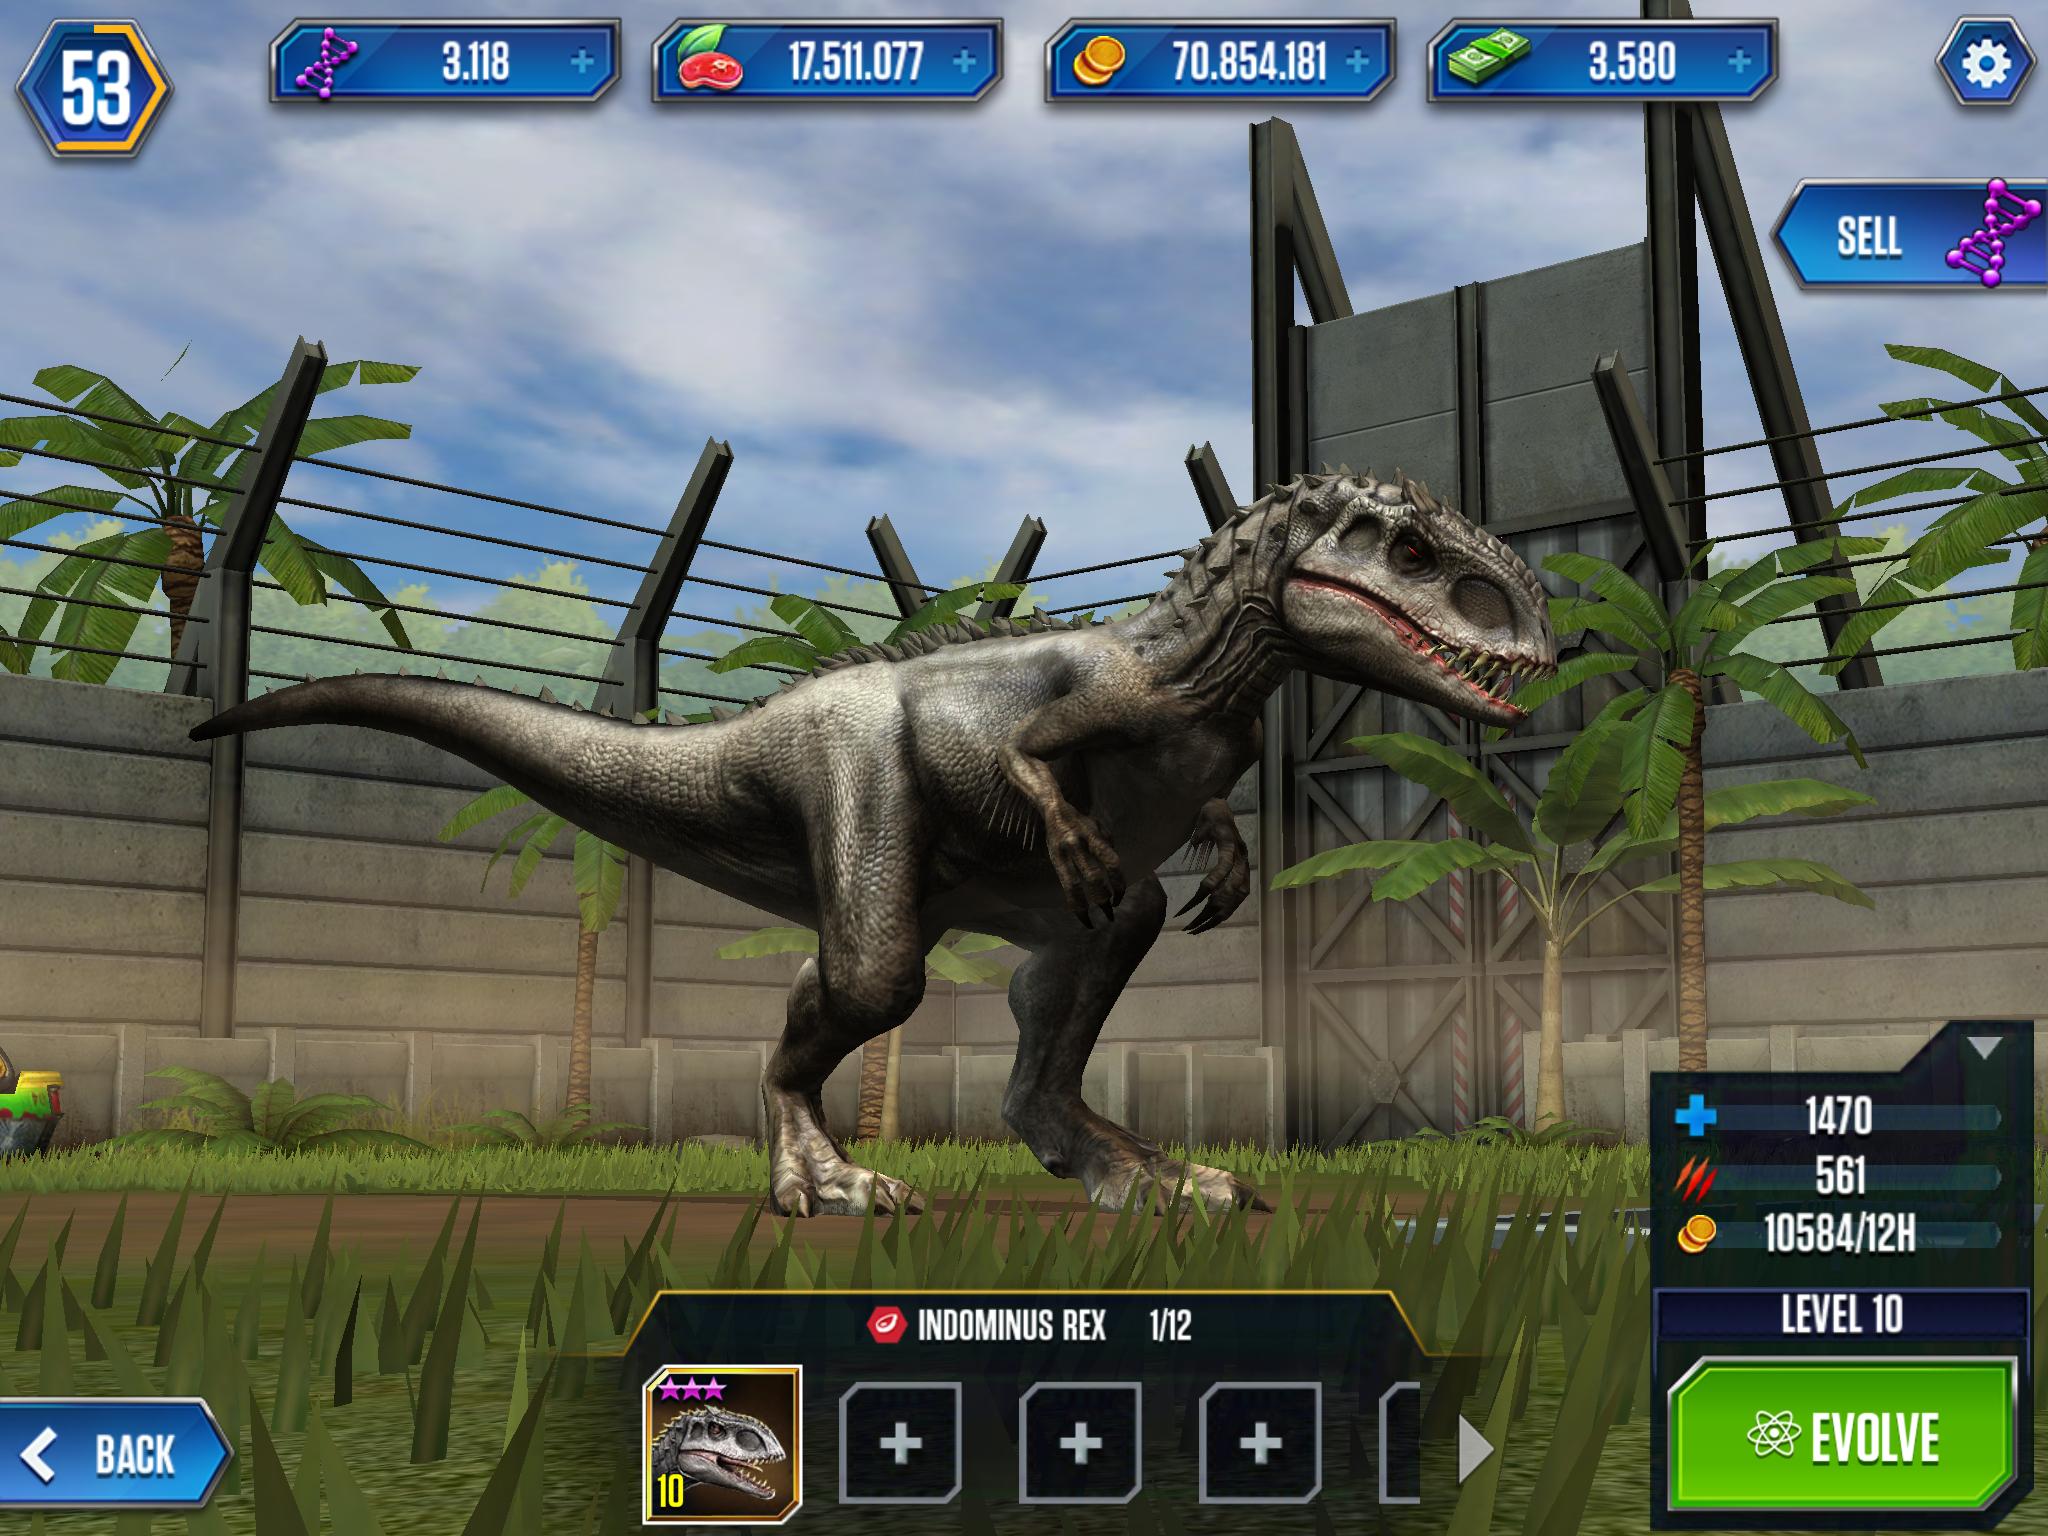 Indominus Rex Jurassic park world, Jurassic park